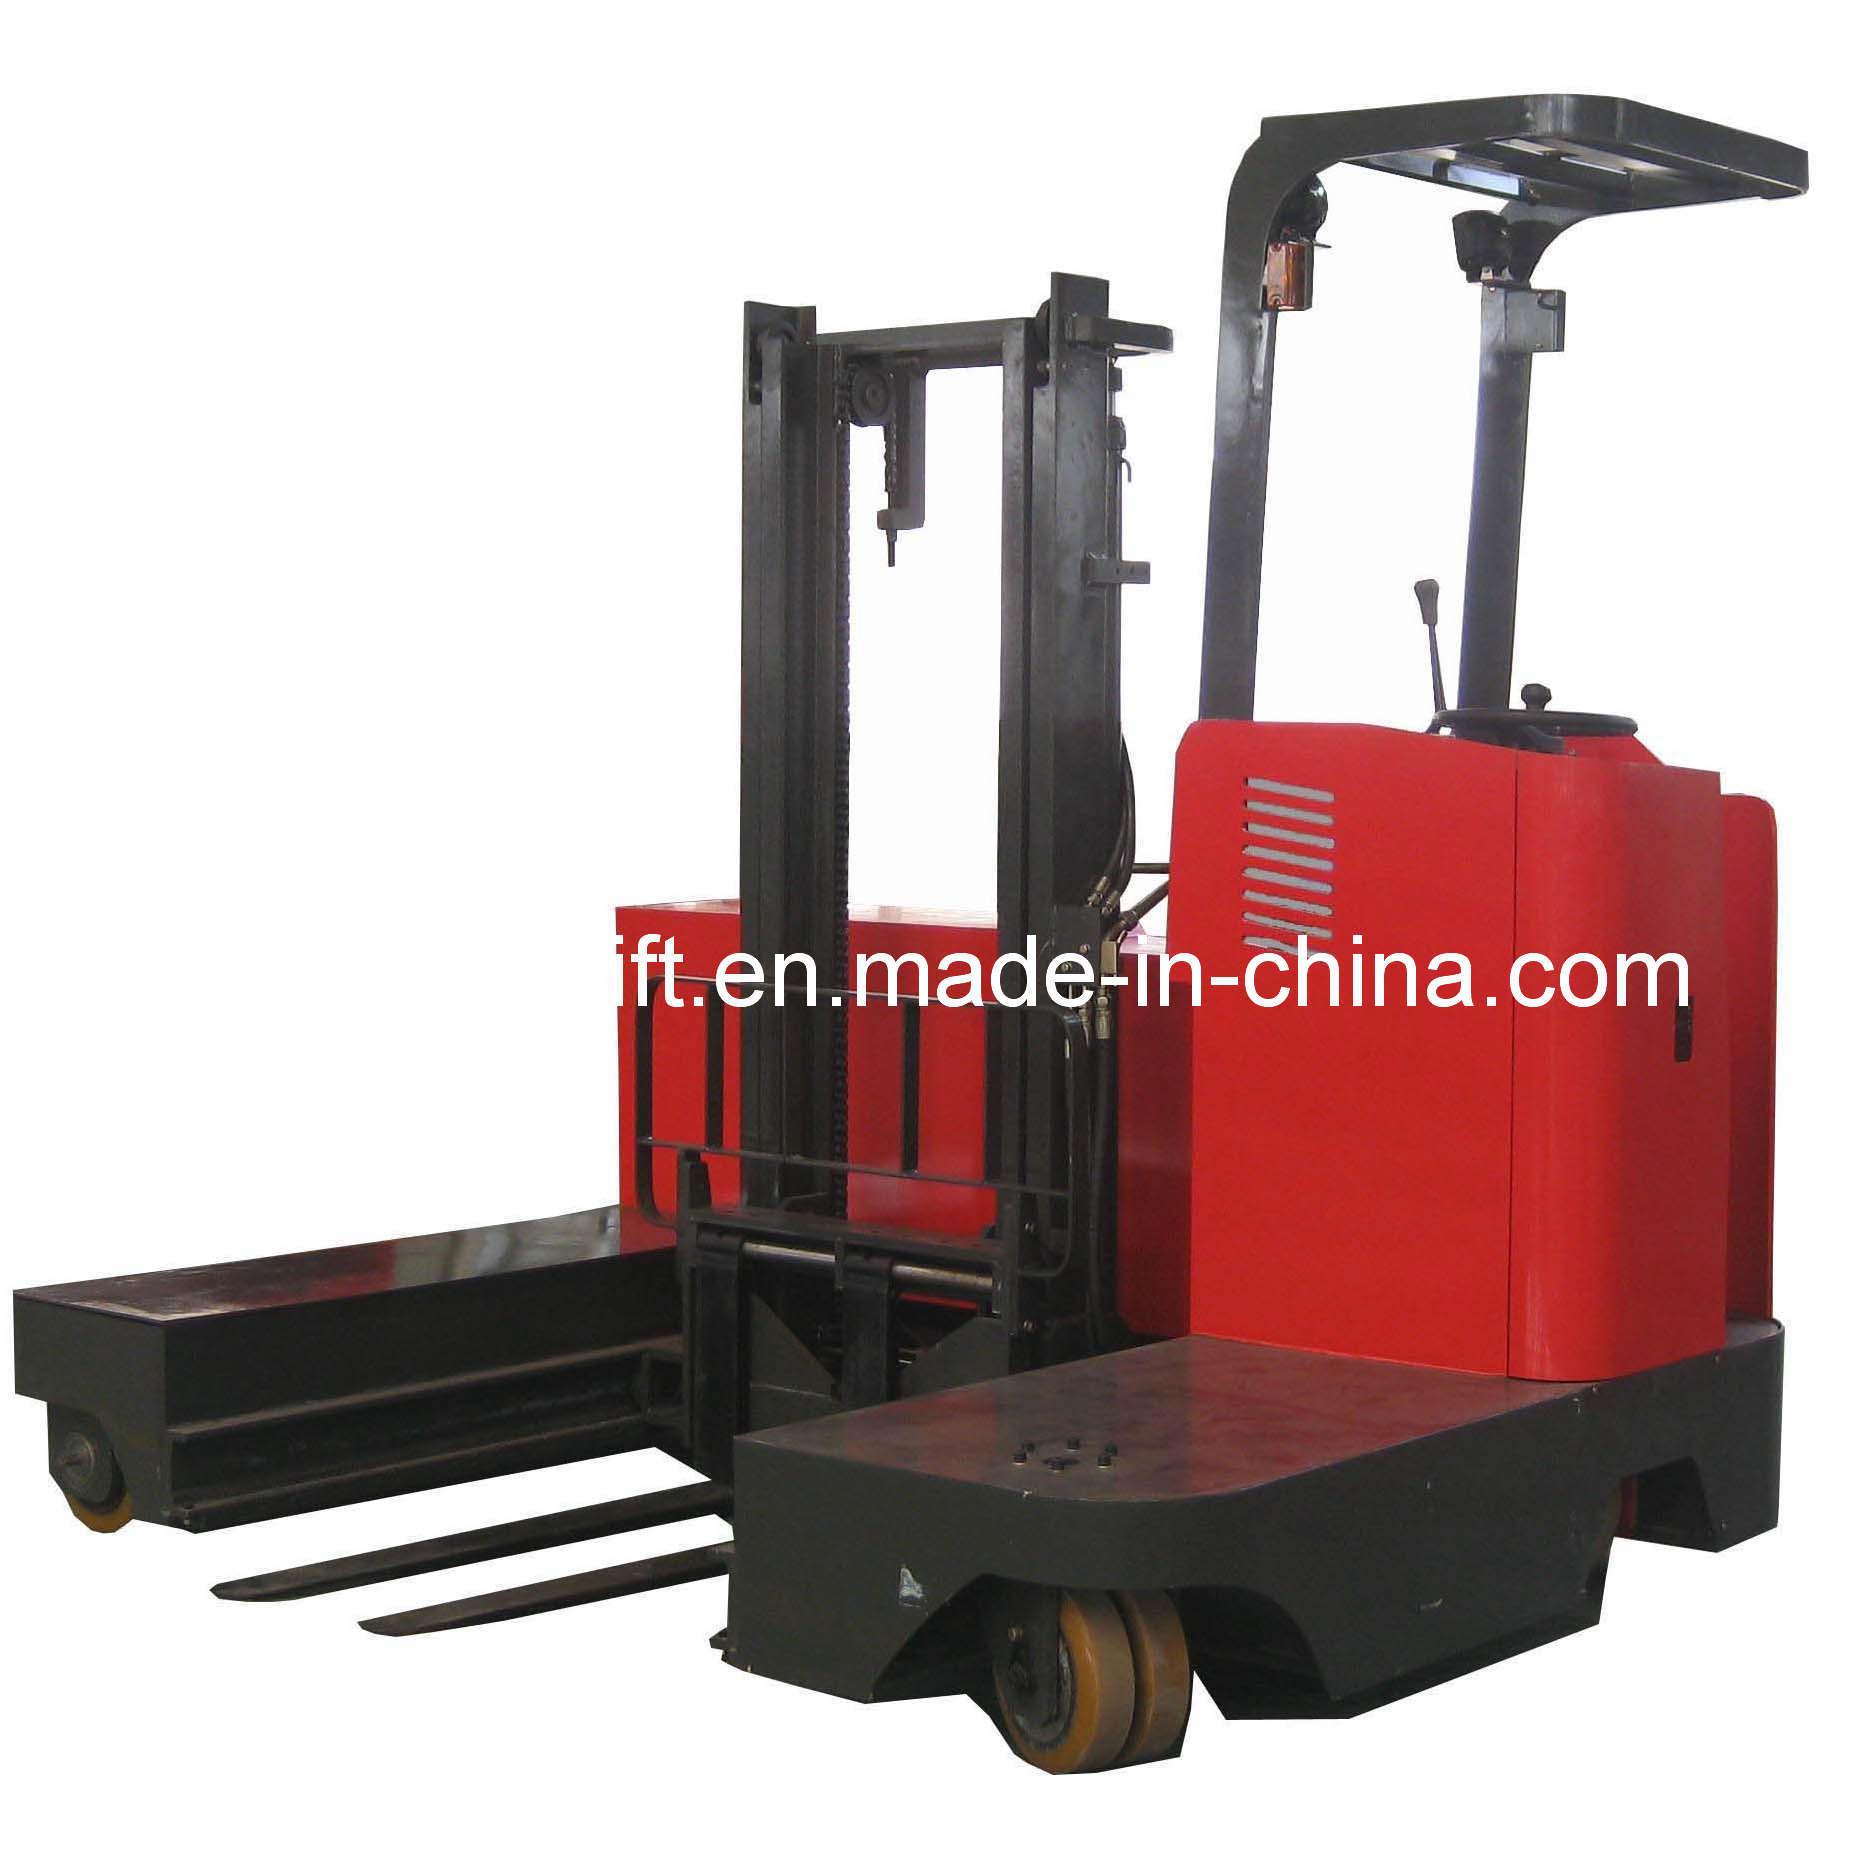 China Electric Side Loading Forklift Td Models Capacity 1